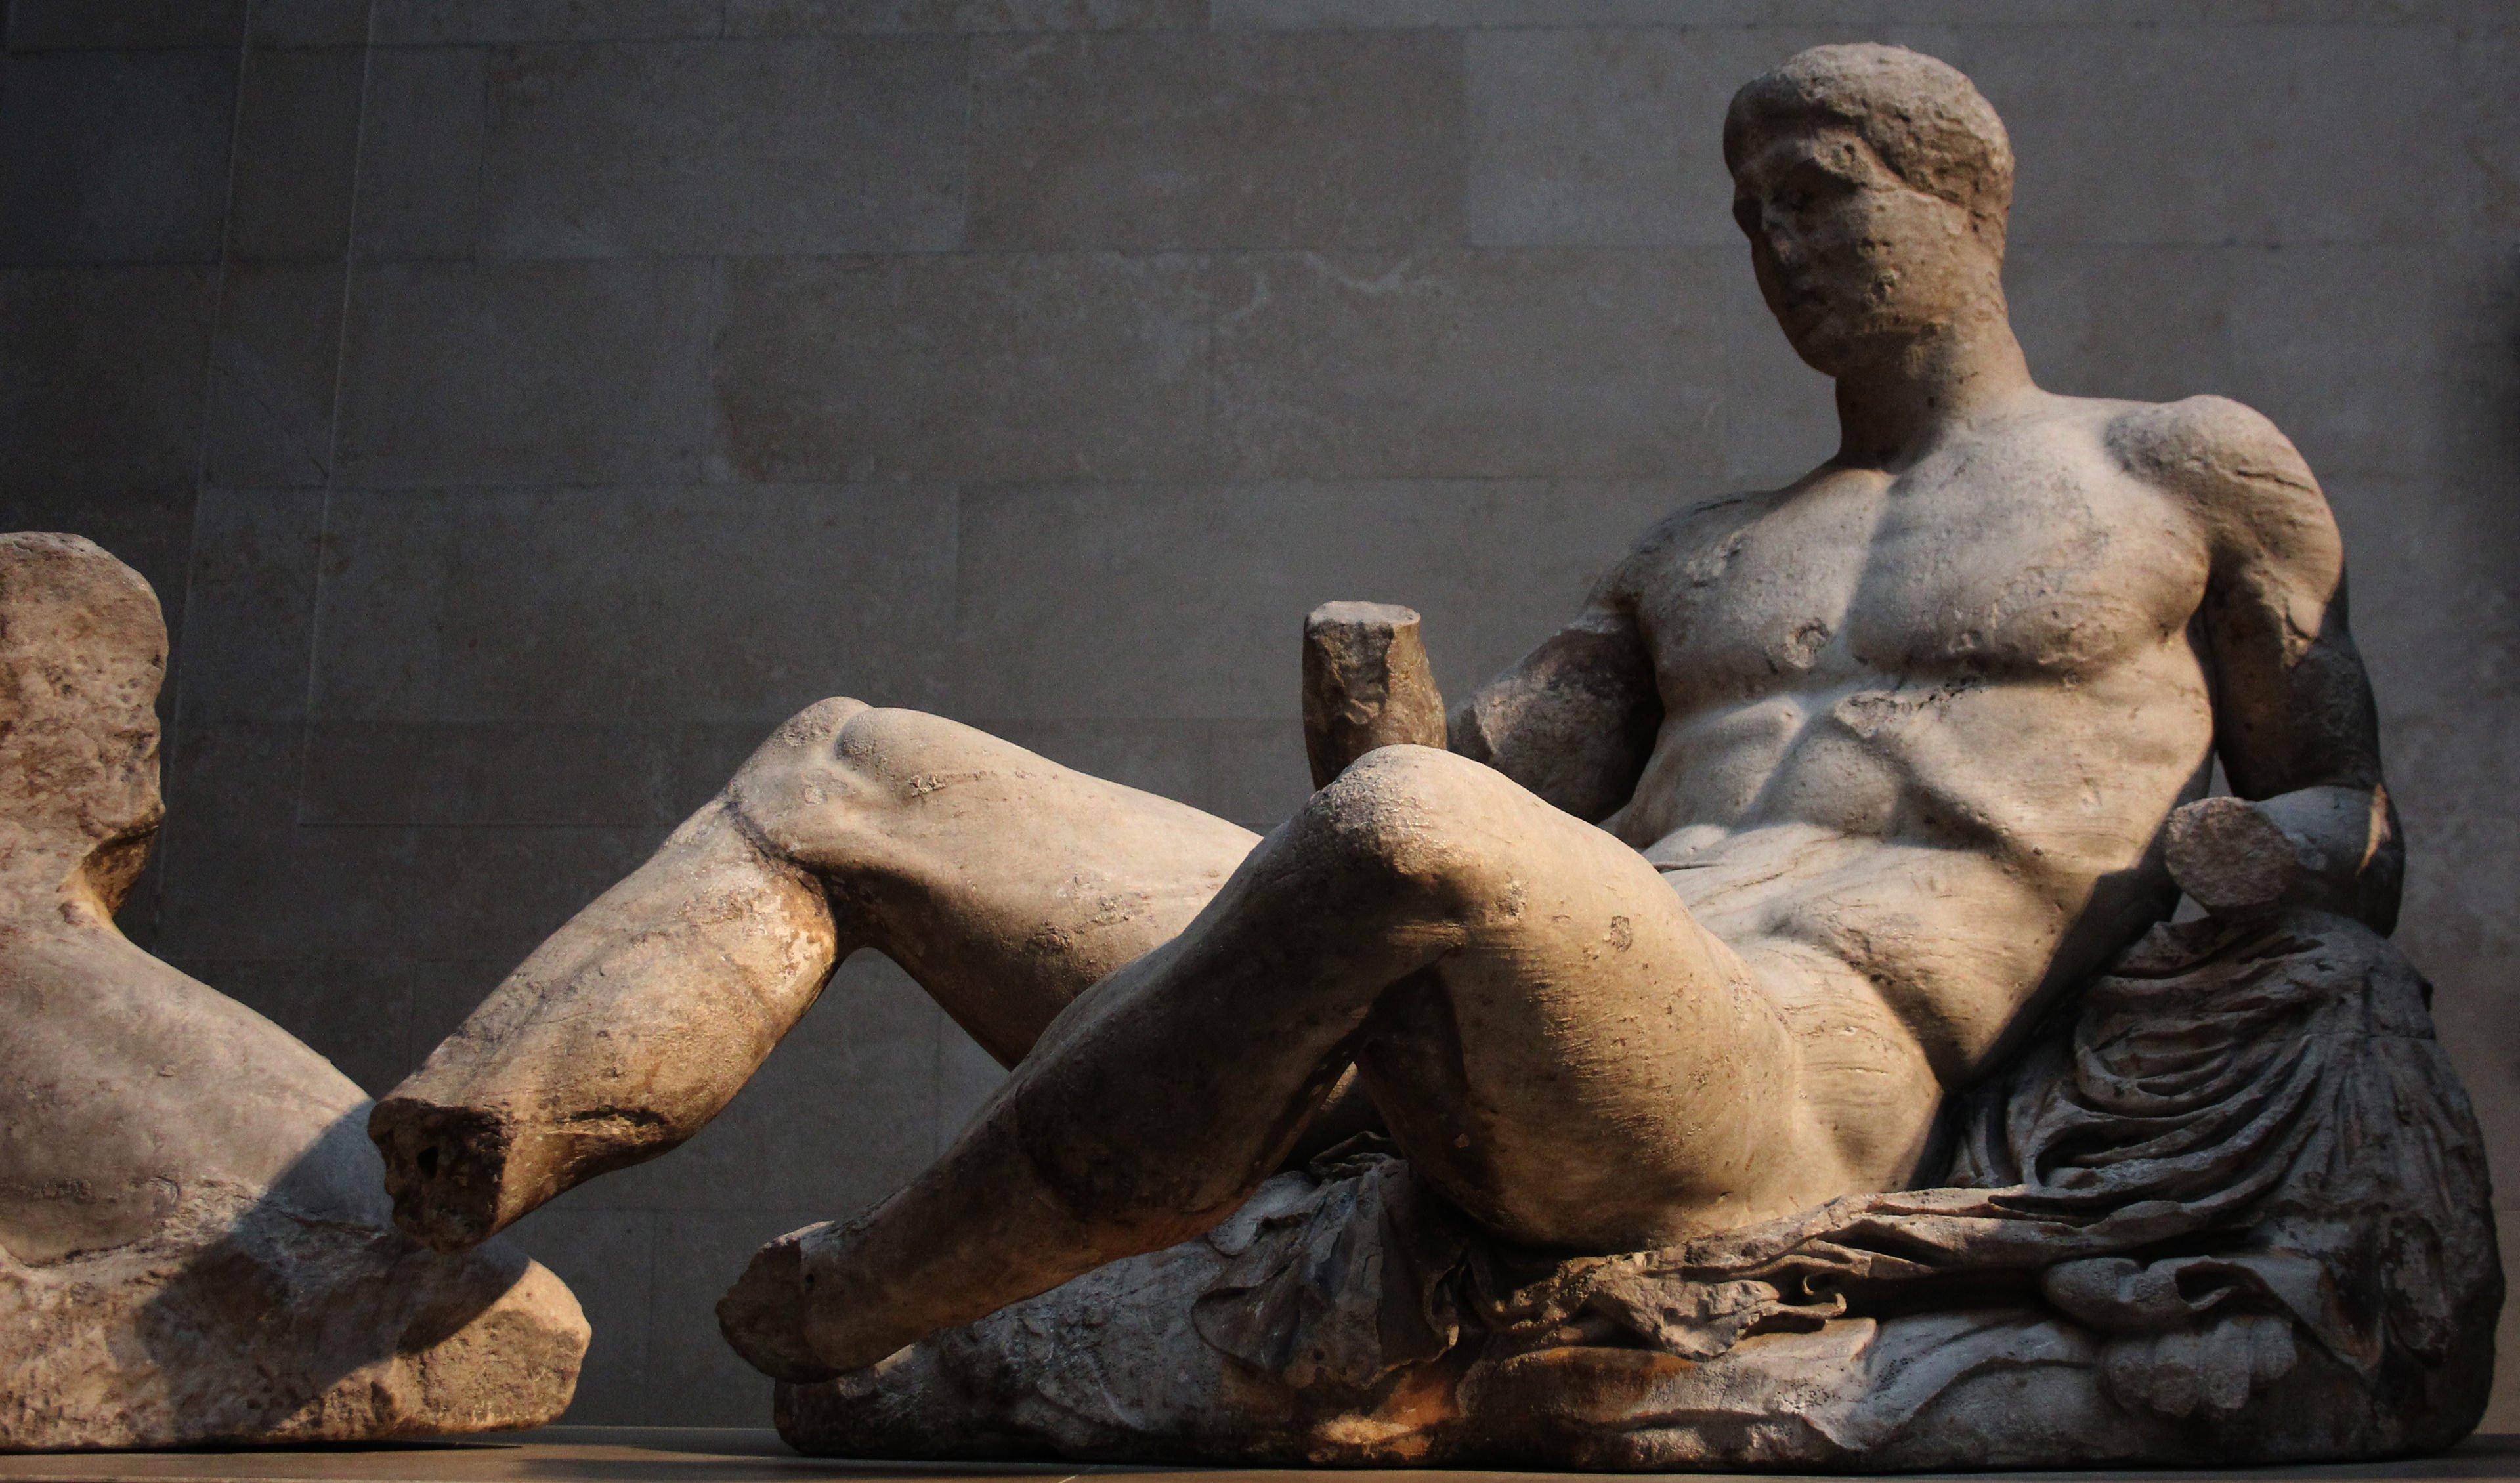 The Parthenon Sculptures (Article) - Ancient History Encyclopedia